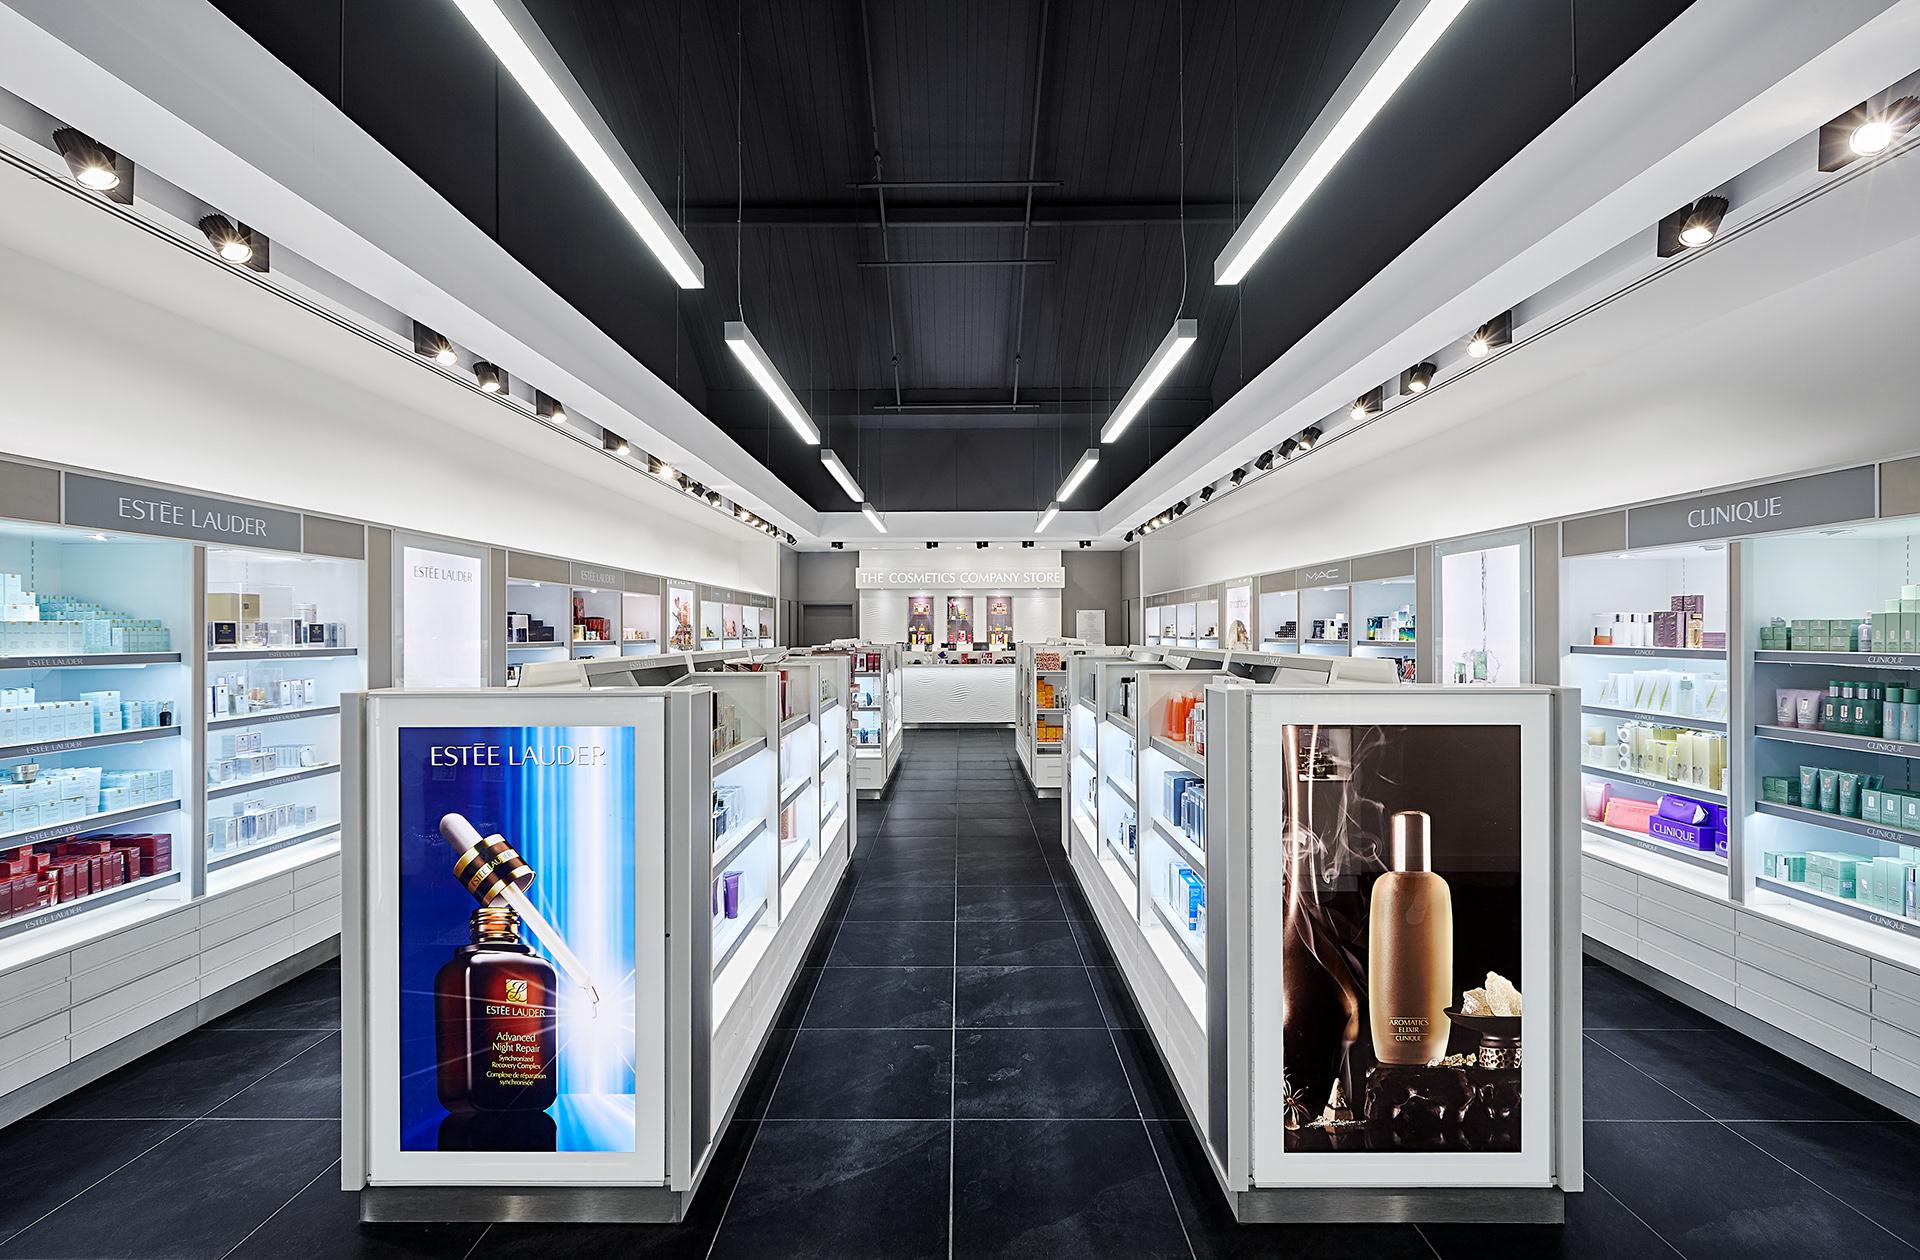 f21691372b8 paula beetlestone - The Cosmetics Company Store